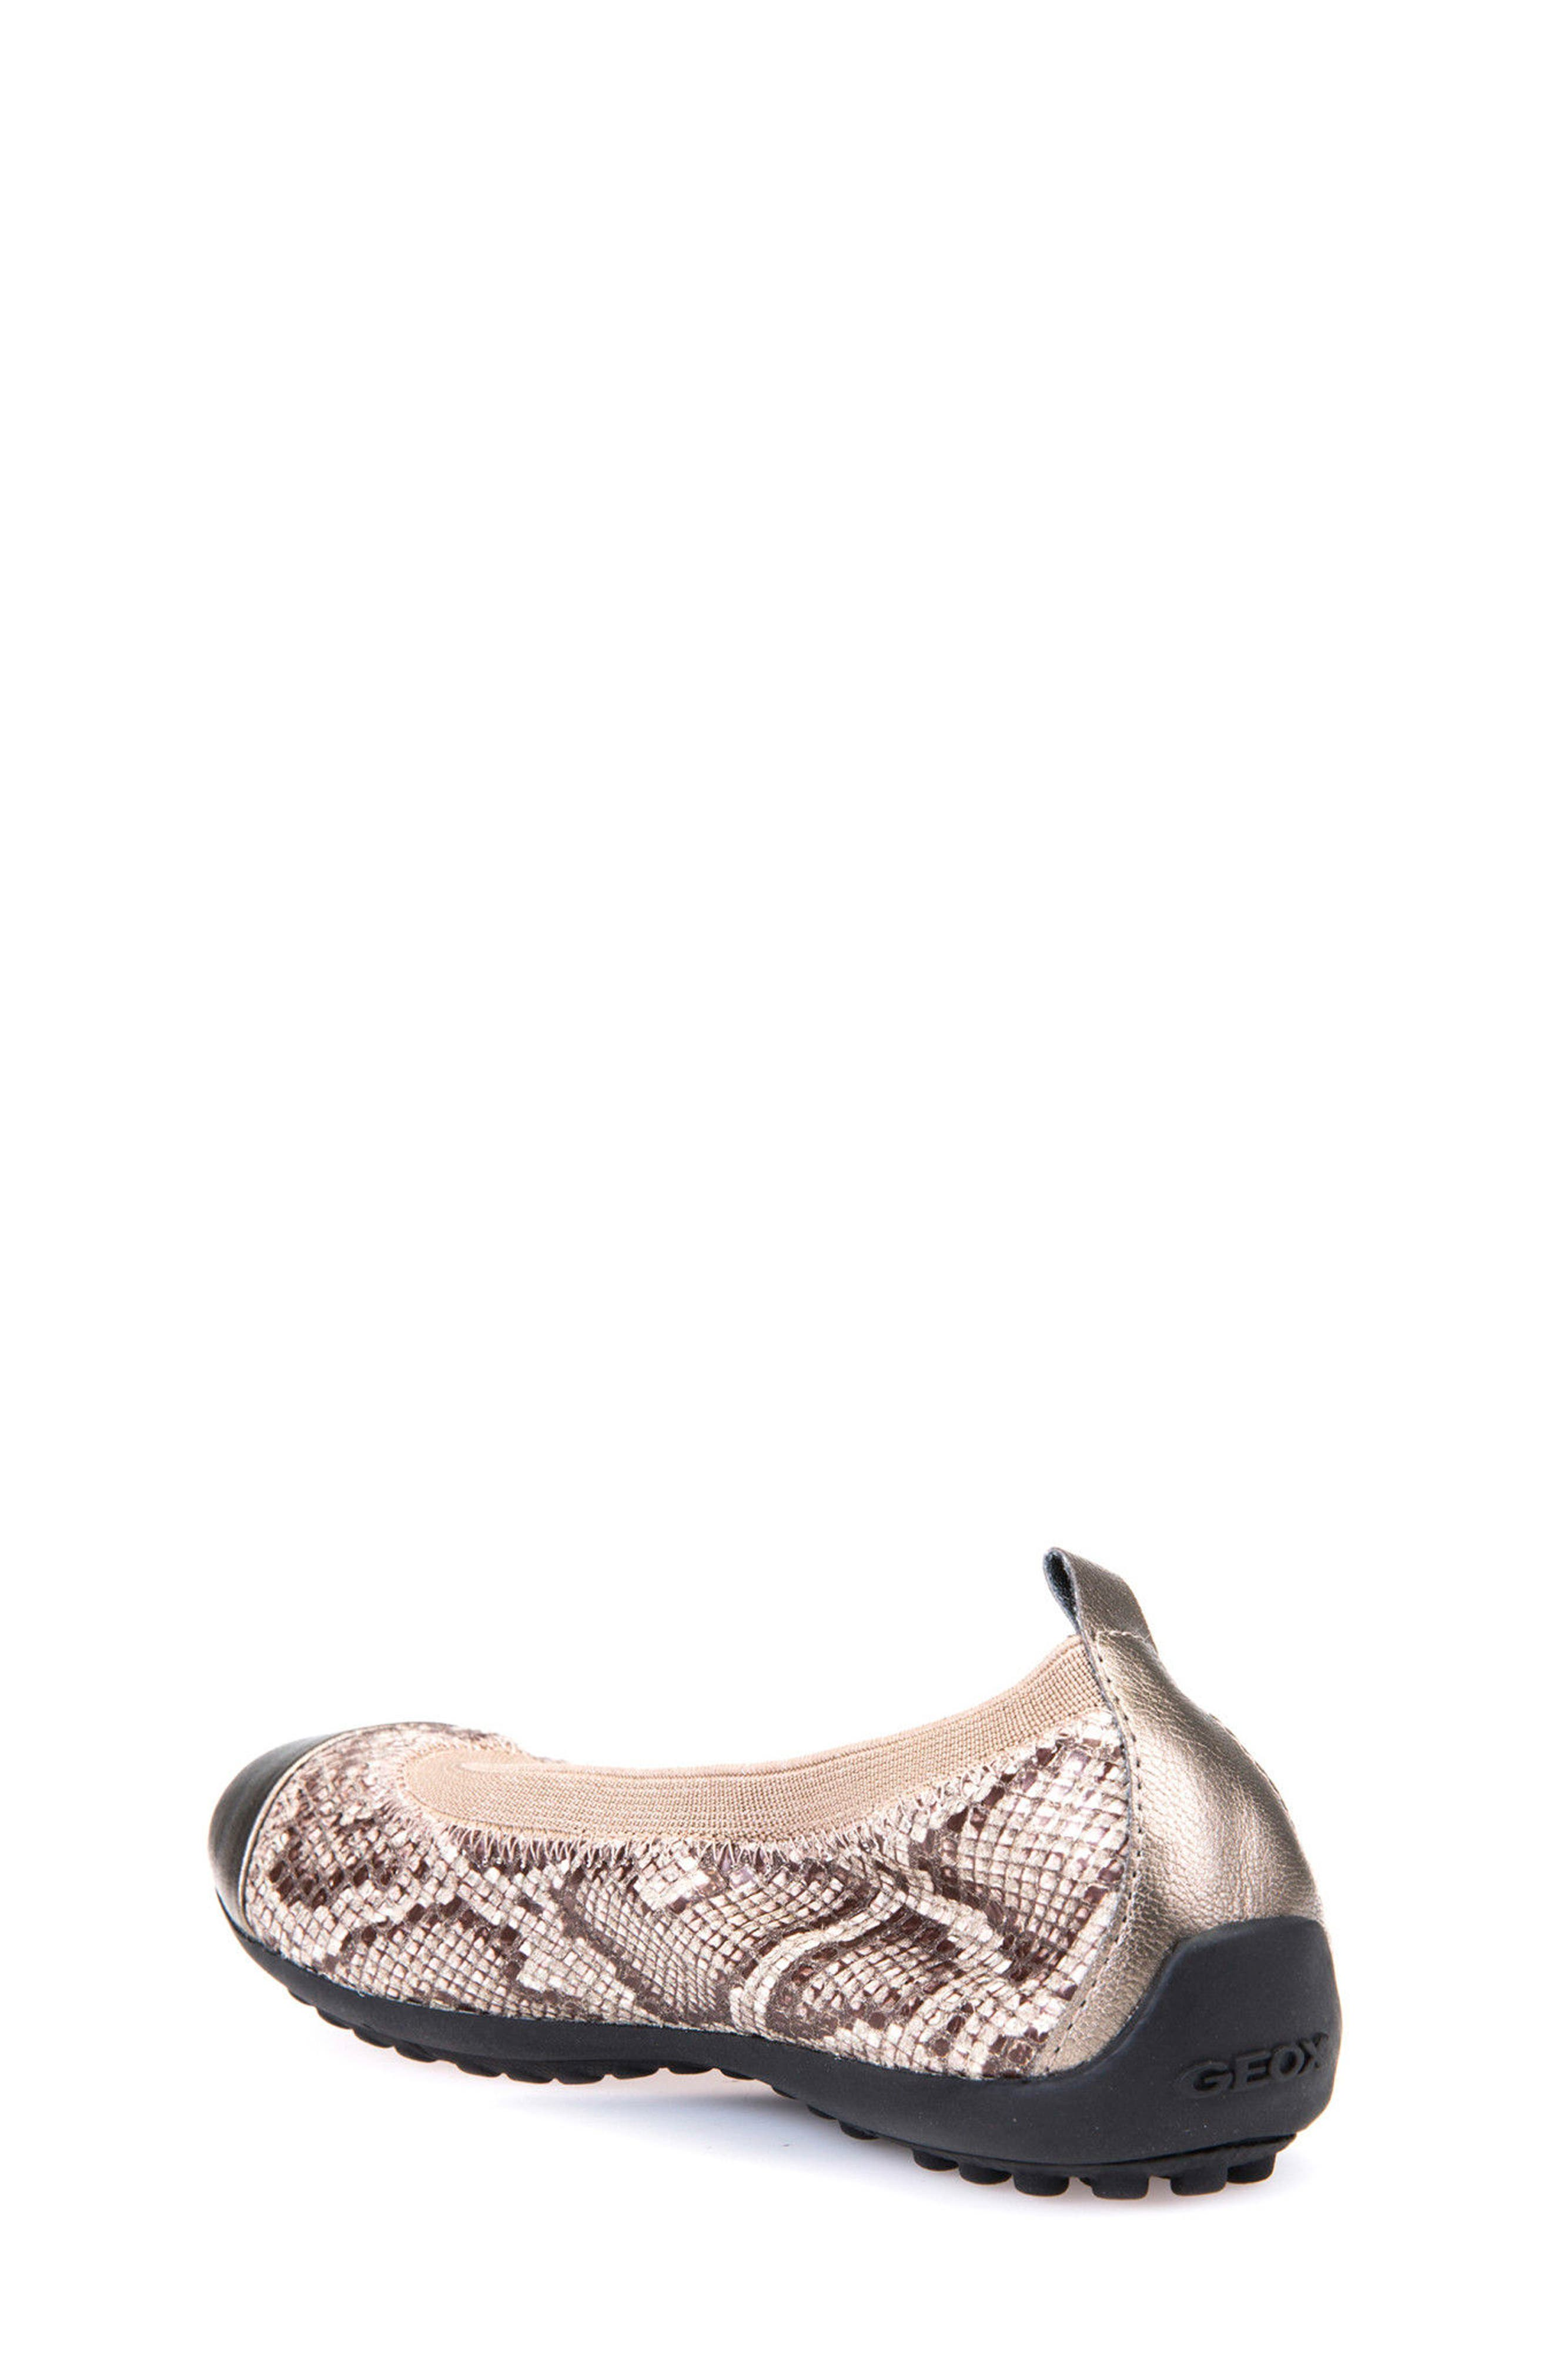 Alternate Image 2  - Geox Jr Piuma Cap Toe Ballerina Flat (Toddler, Little Kid & Big Kid)